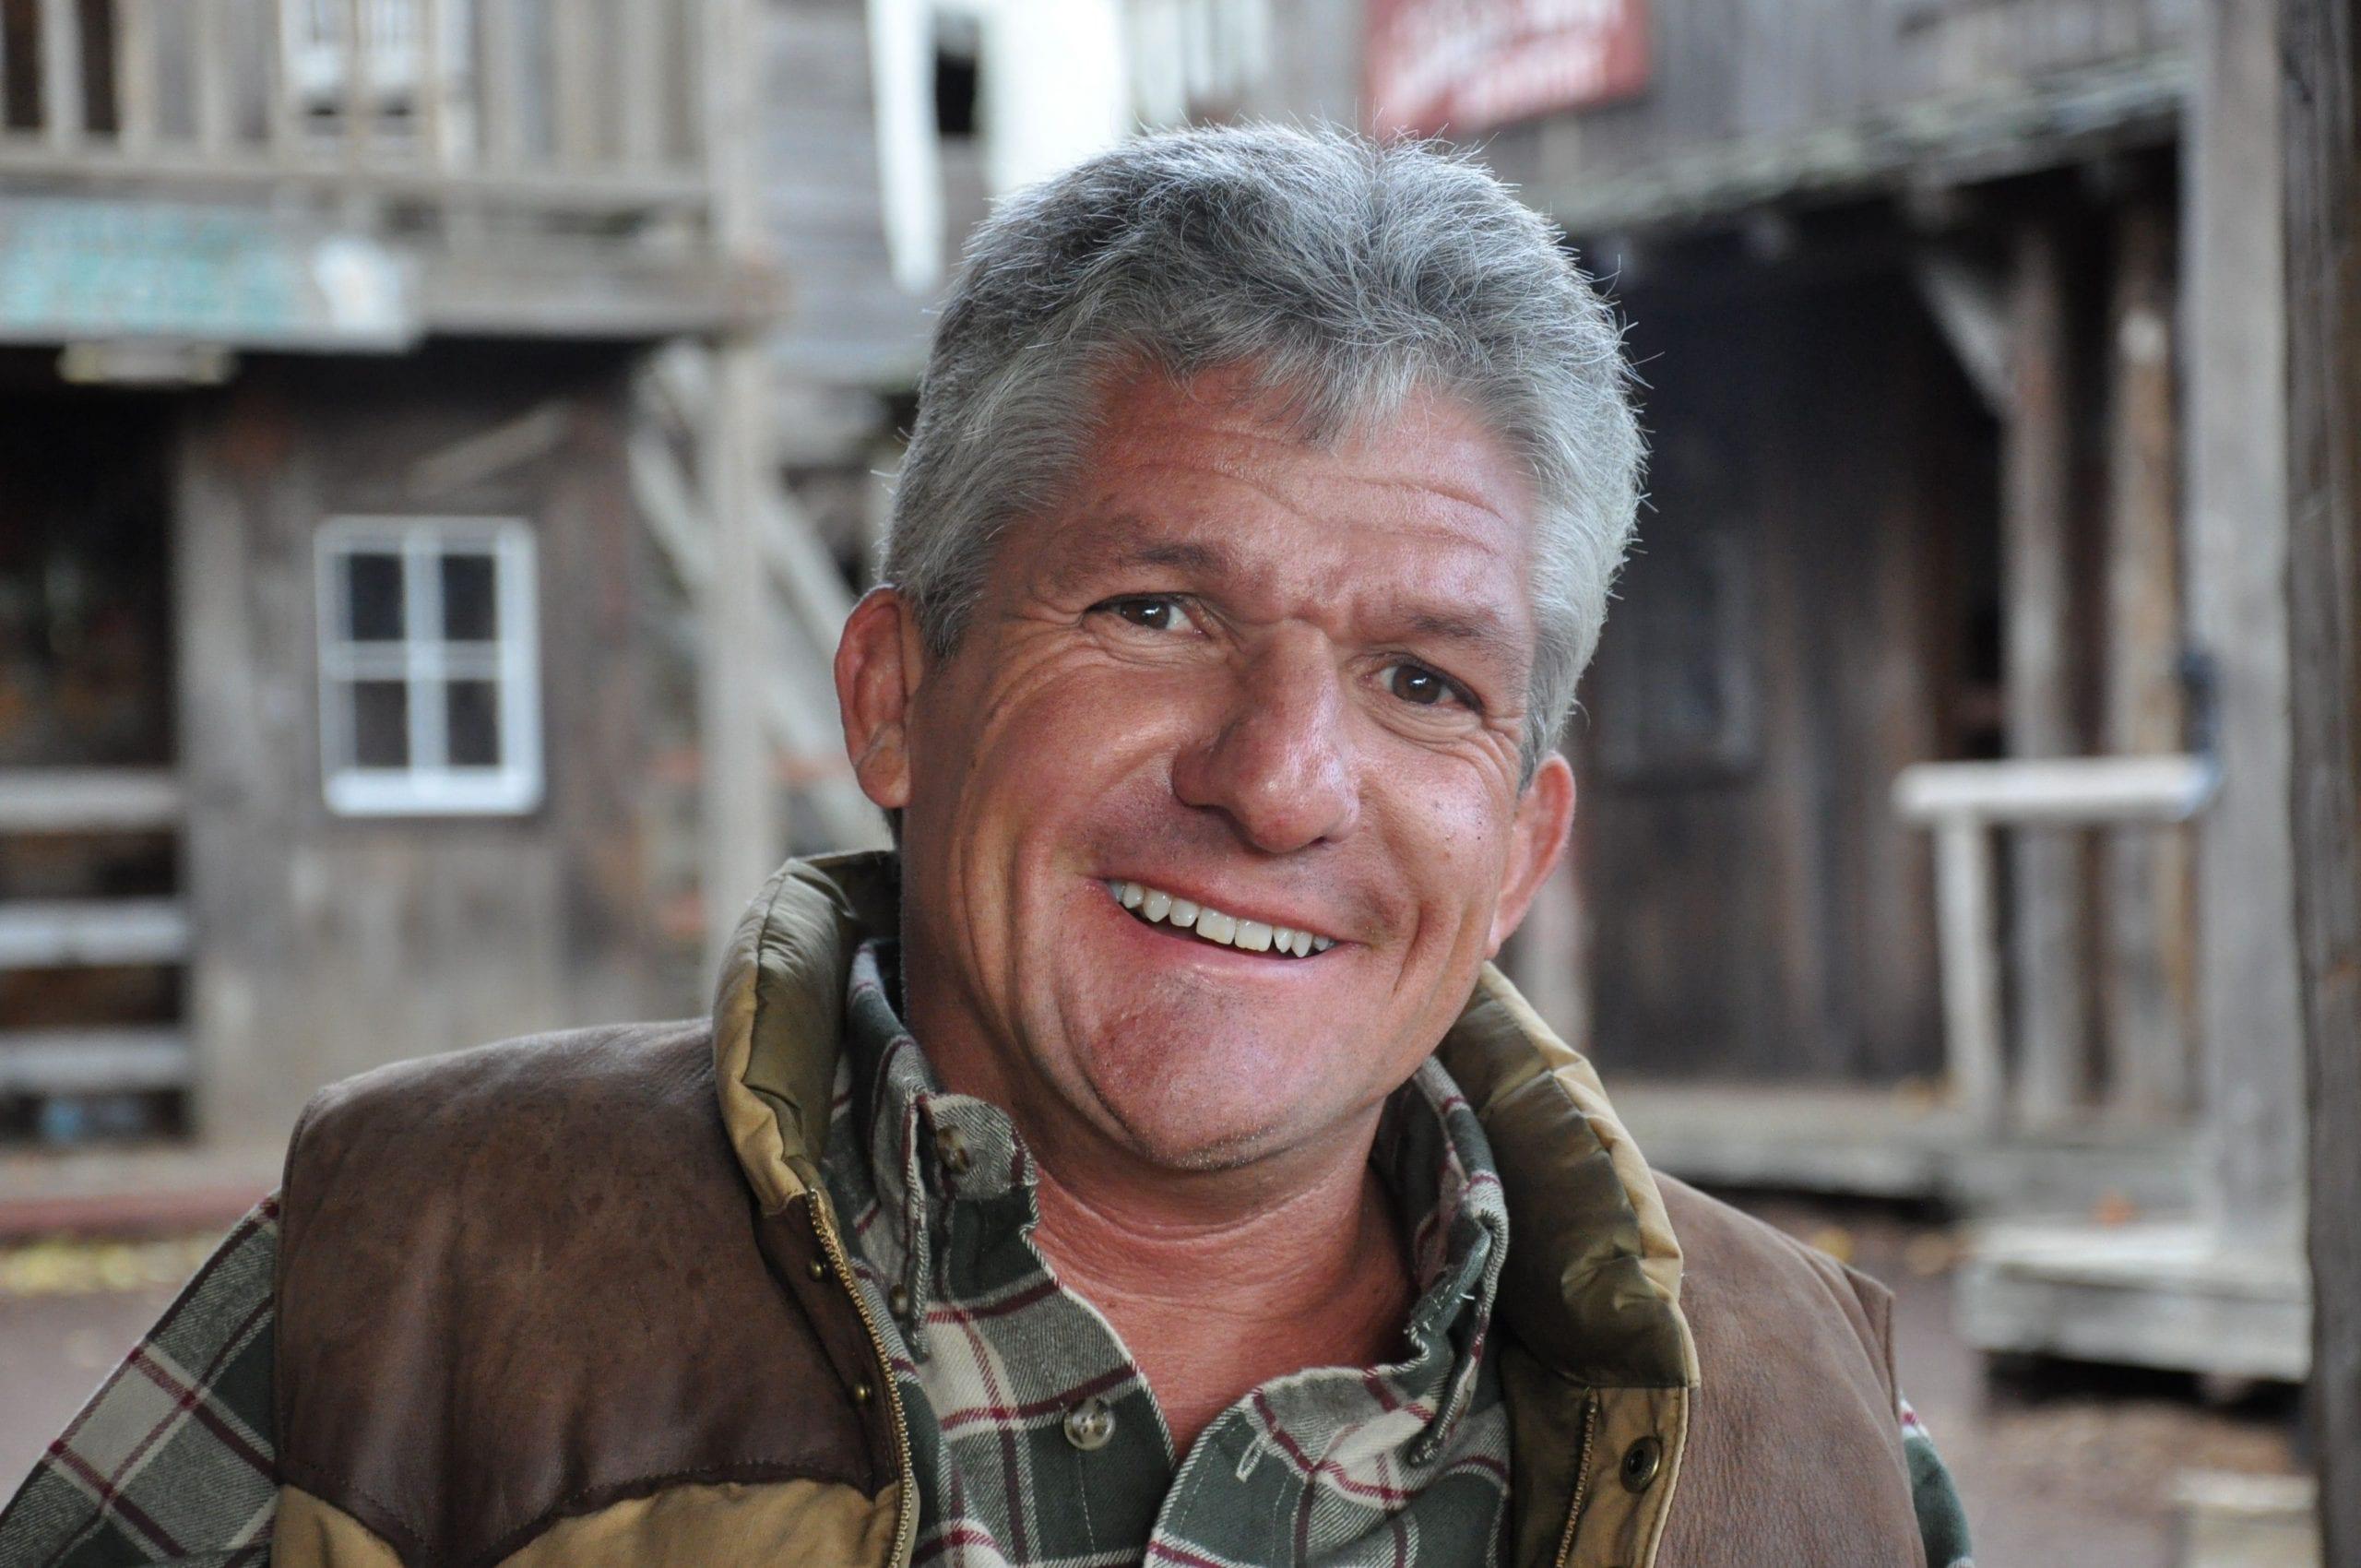 Matt Roloff author